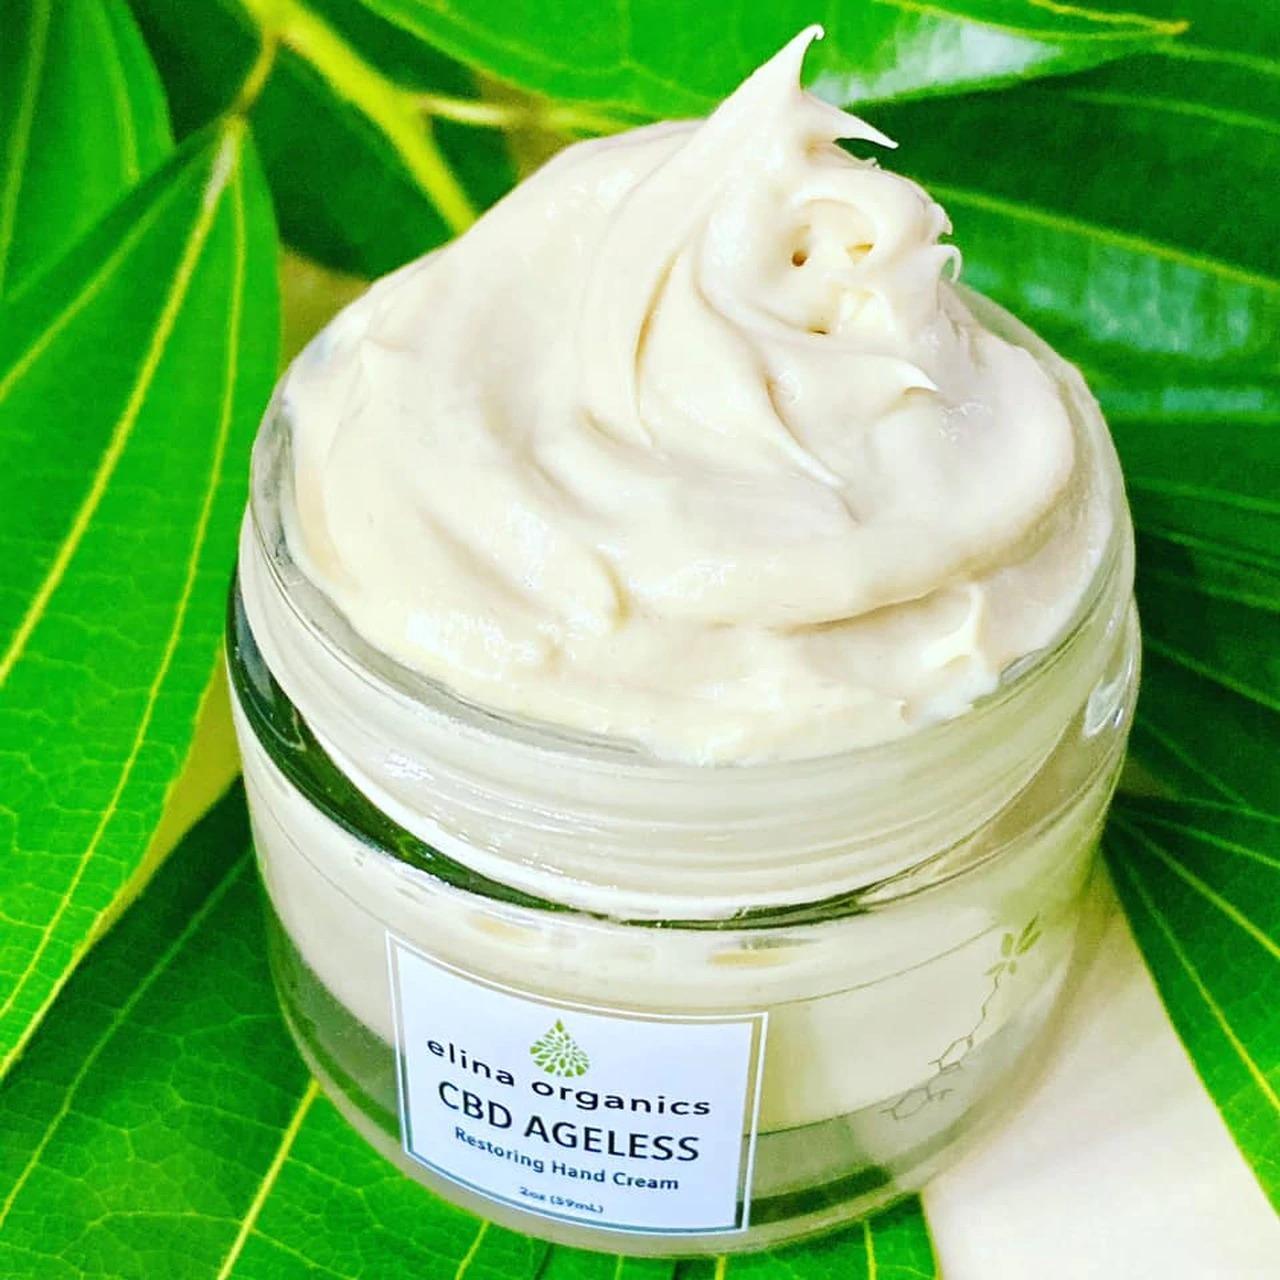 Elina Organics CBD Ageless Restoring Hand Cream